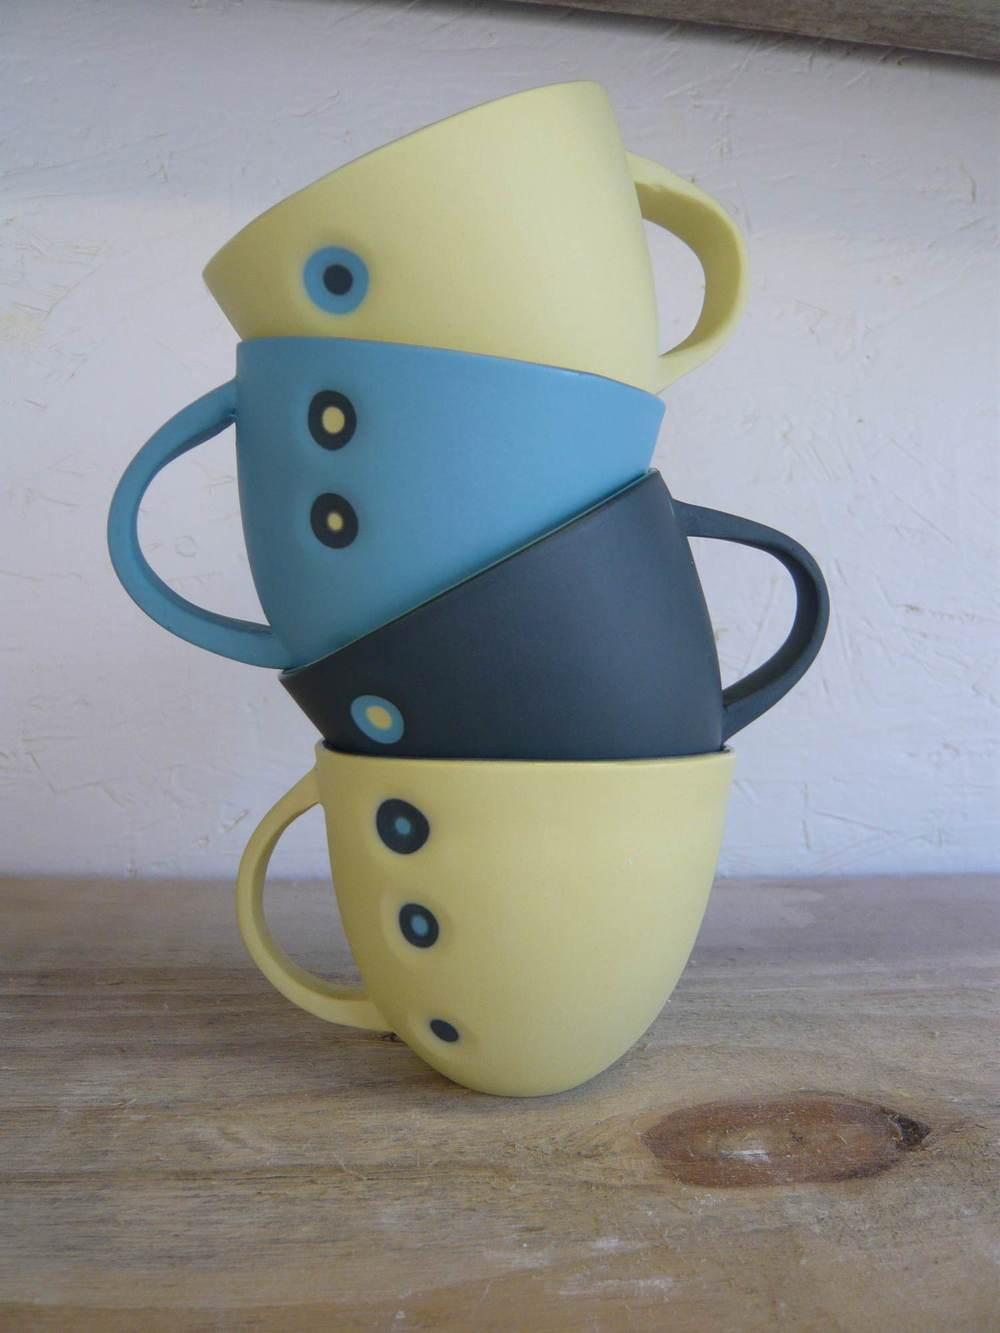 Finger dent cups 300dpi (1)_Fotor.jpg